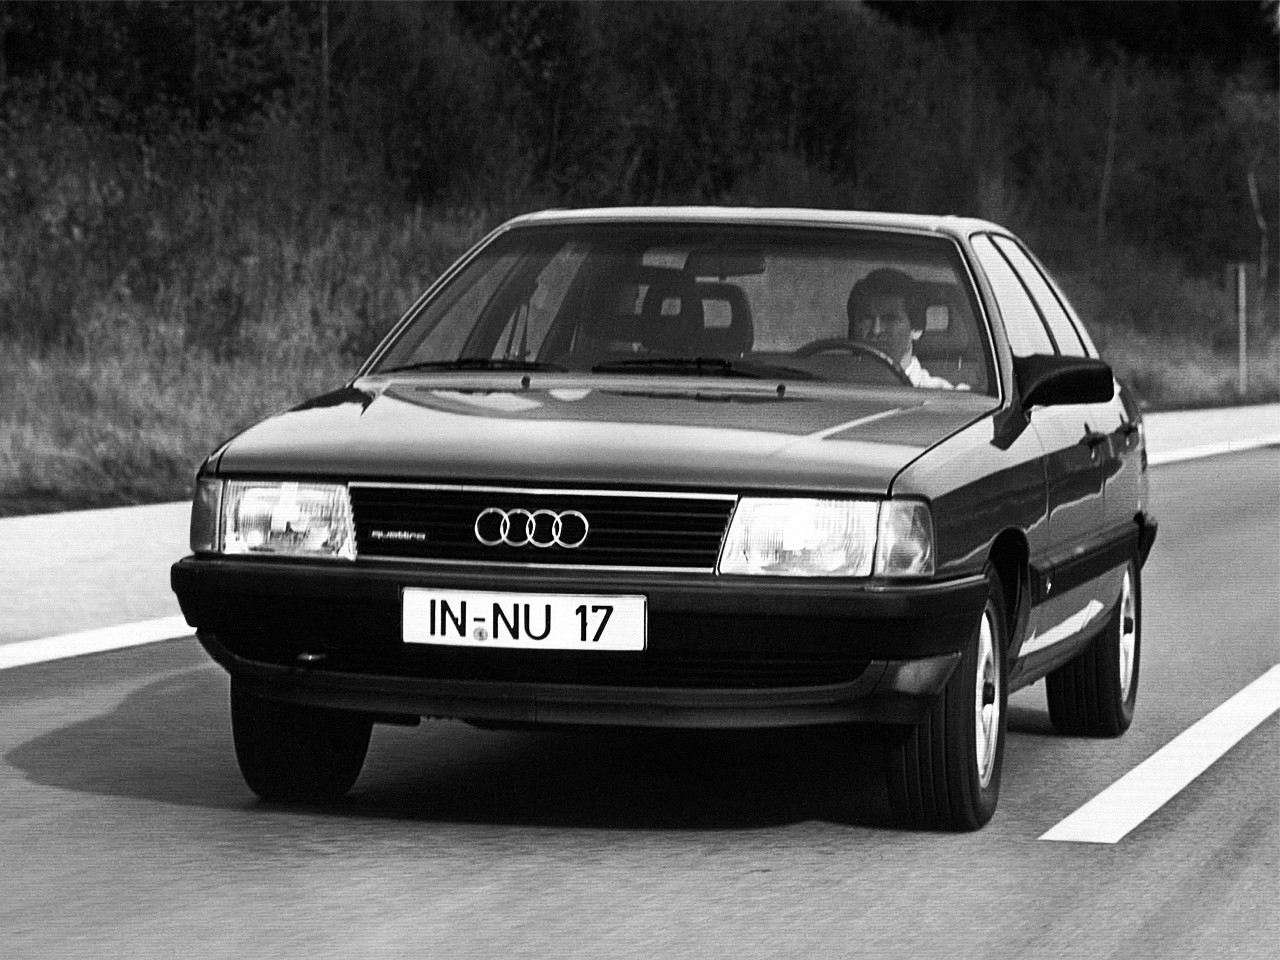 Green Auto Sales >> AUDI 100 (C3) specs - 1982, 1983, 1984, 1985, 1986, 1987, 1988, 1989, 1990, 1991 - autoevolution